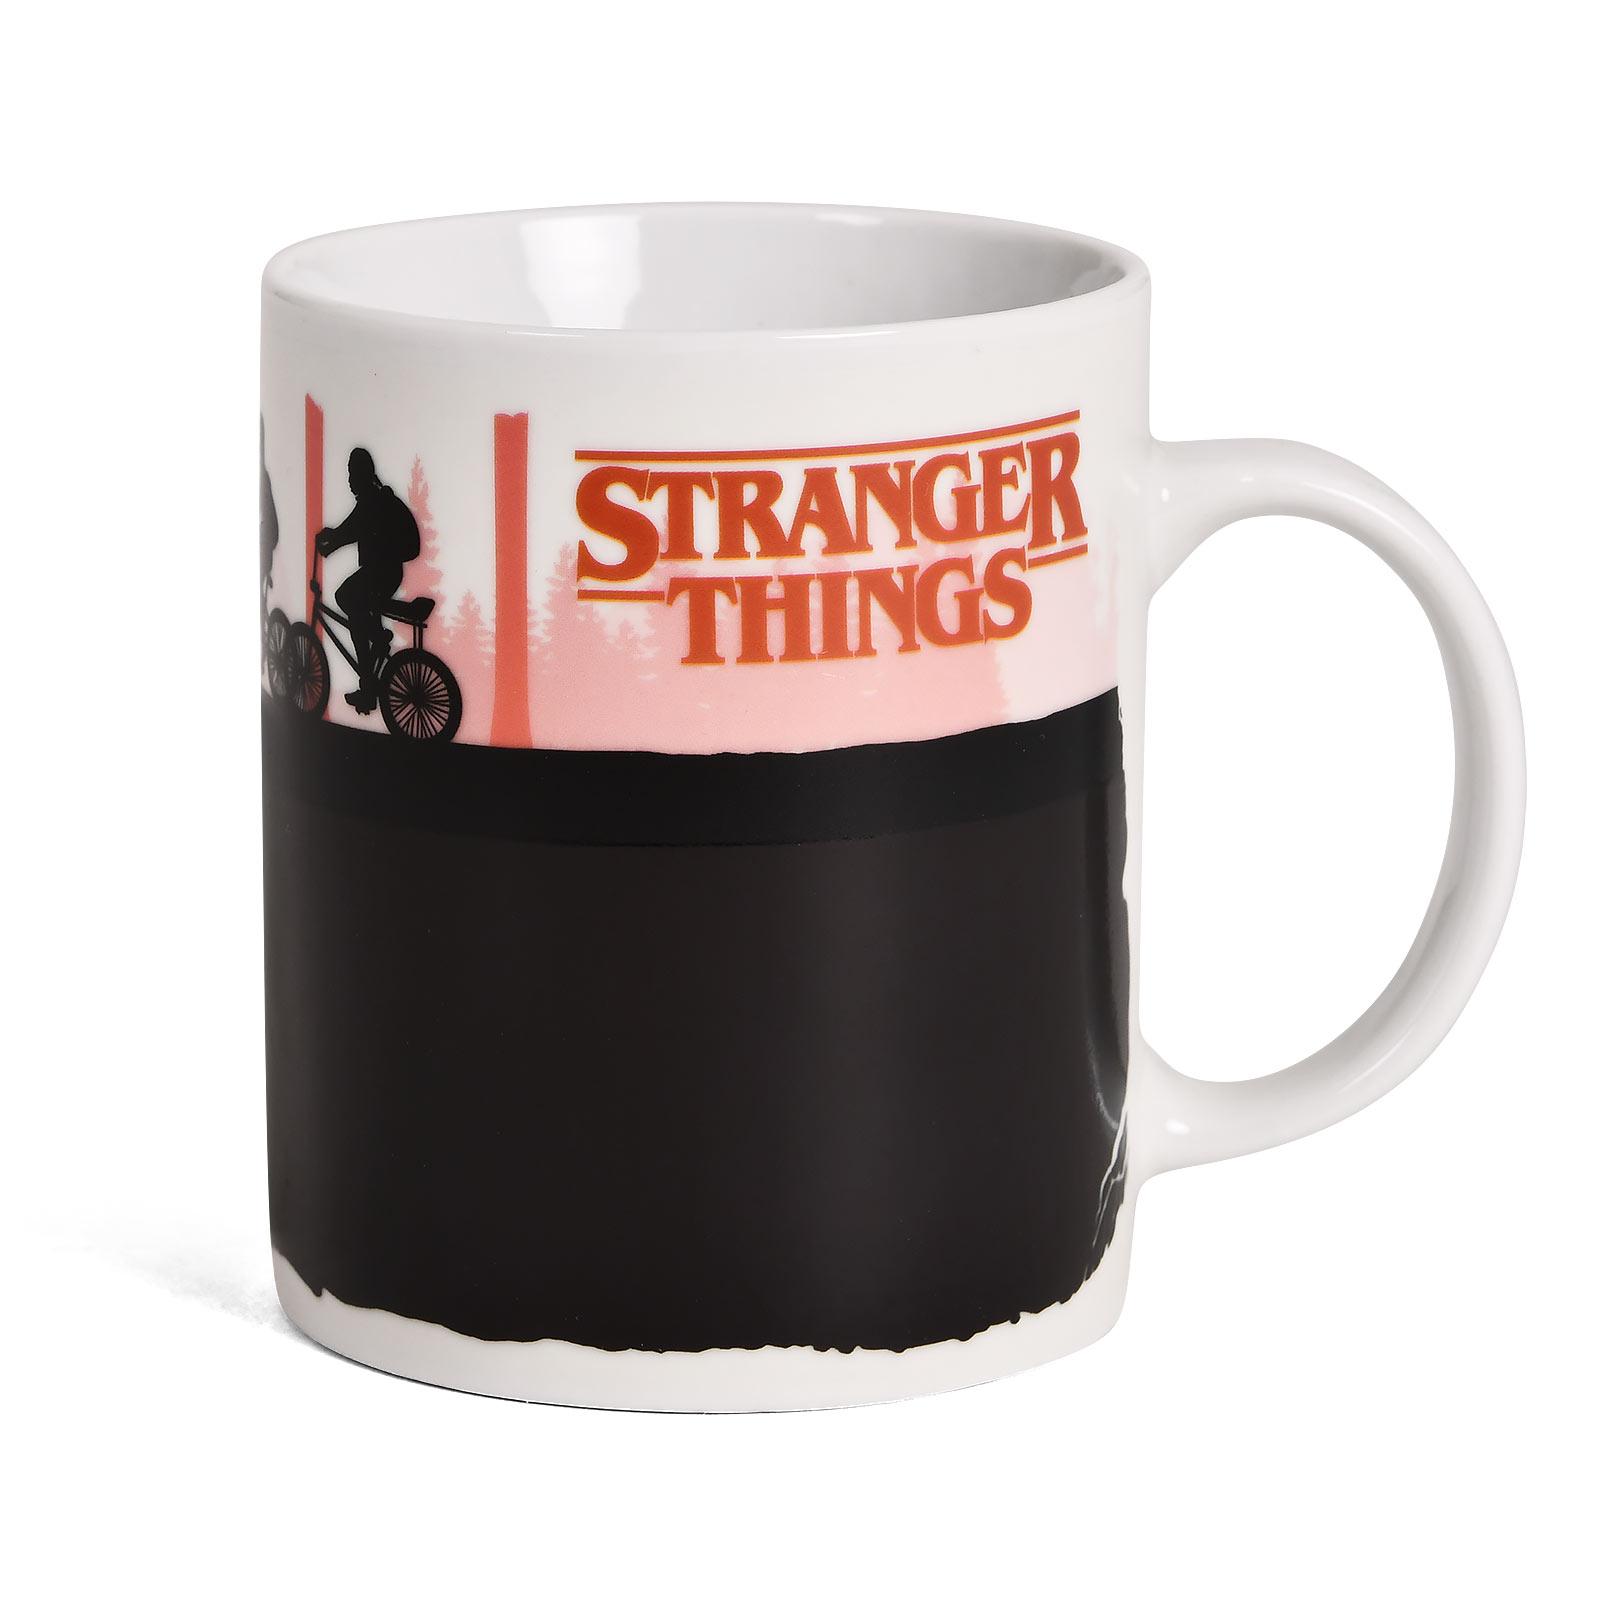 Stranger Things - Upside Down Thermoeffekt Tasse